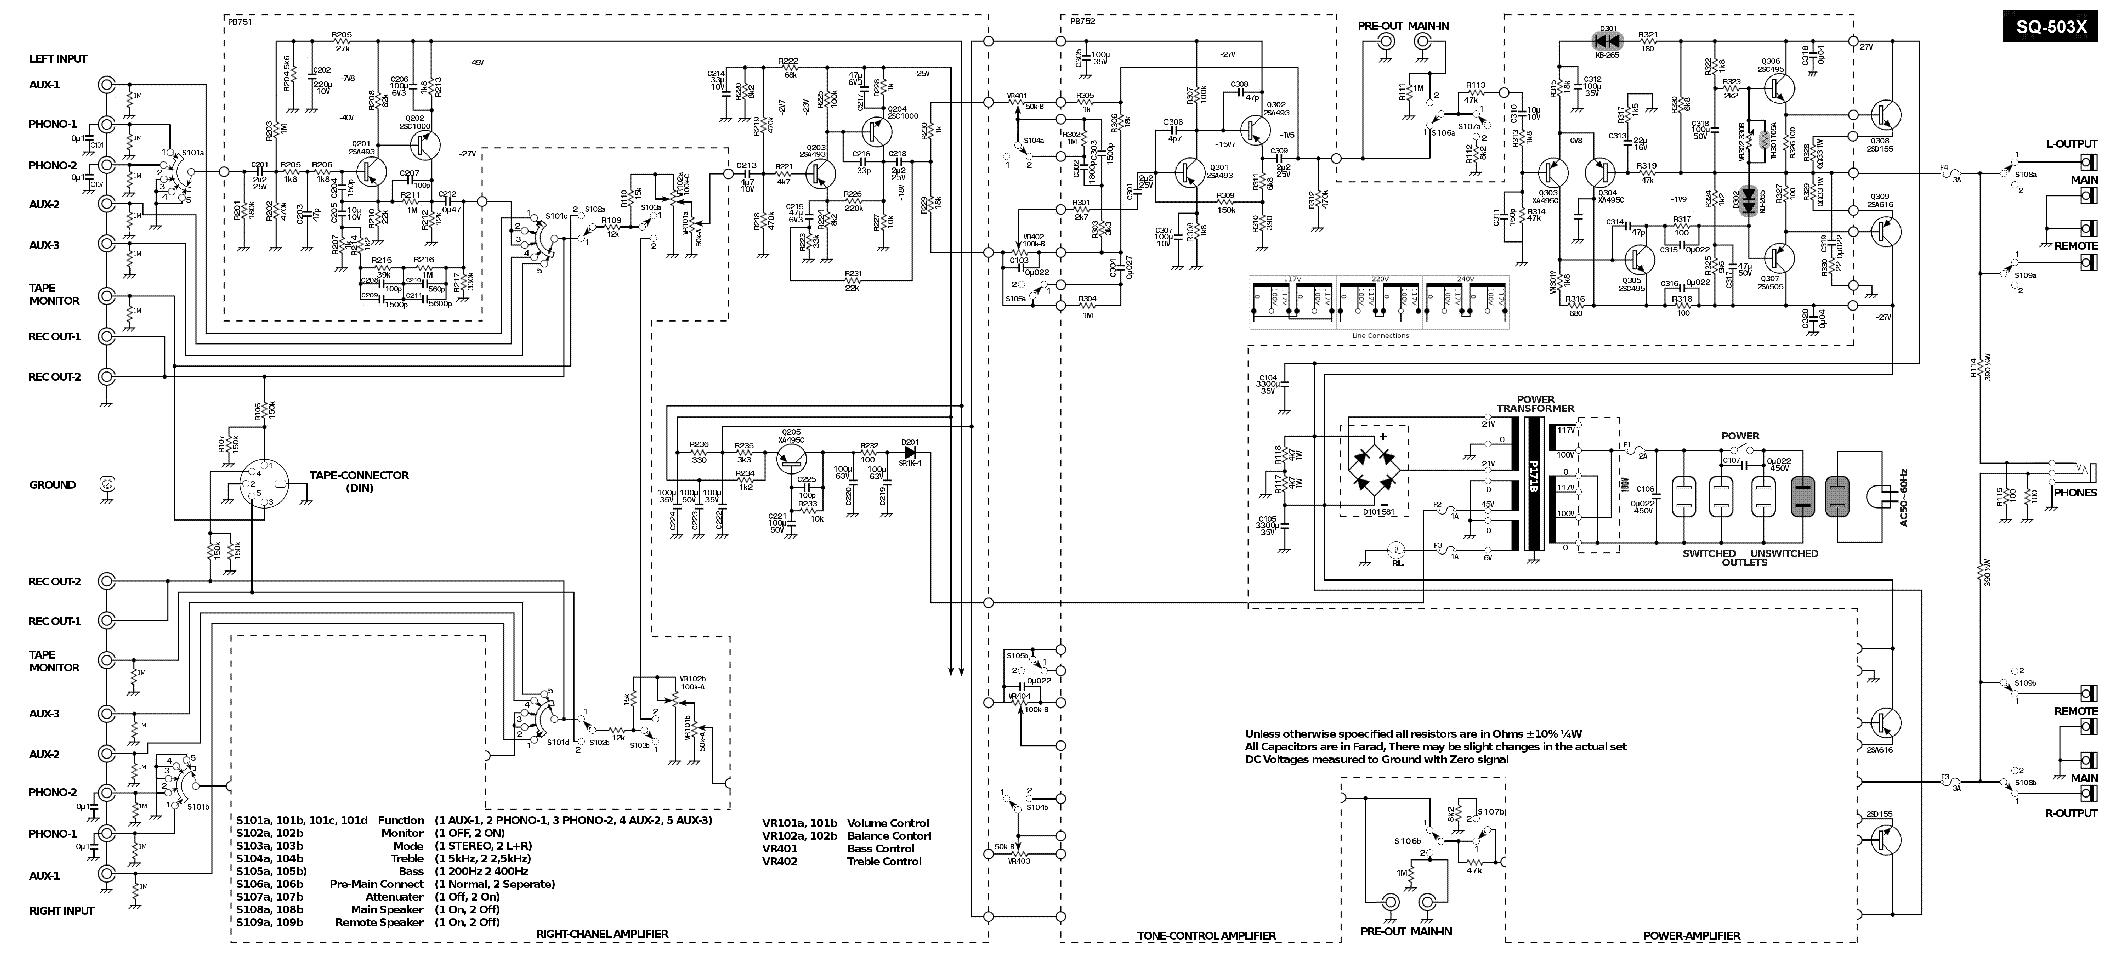 Luxman lv-103 u / lv-105 u manual | integrated amplifiers | luxman.